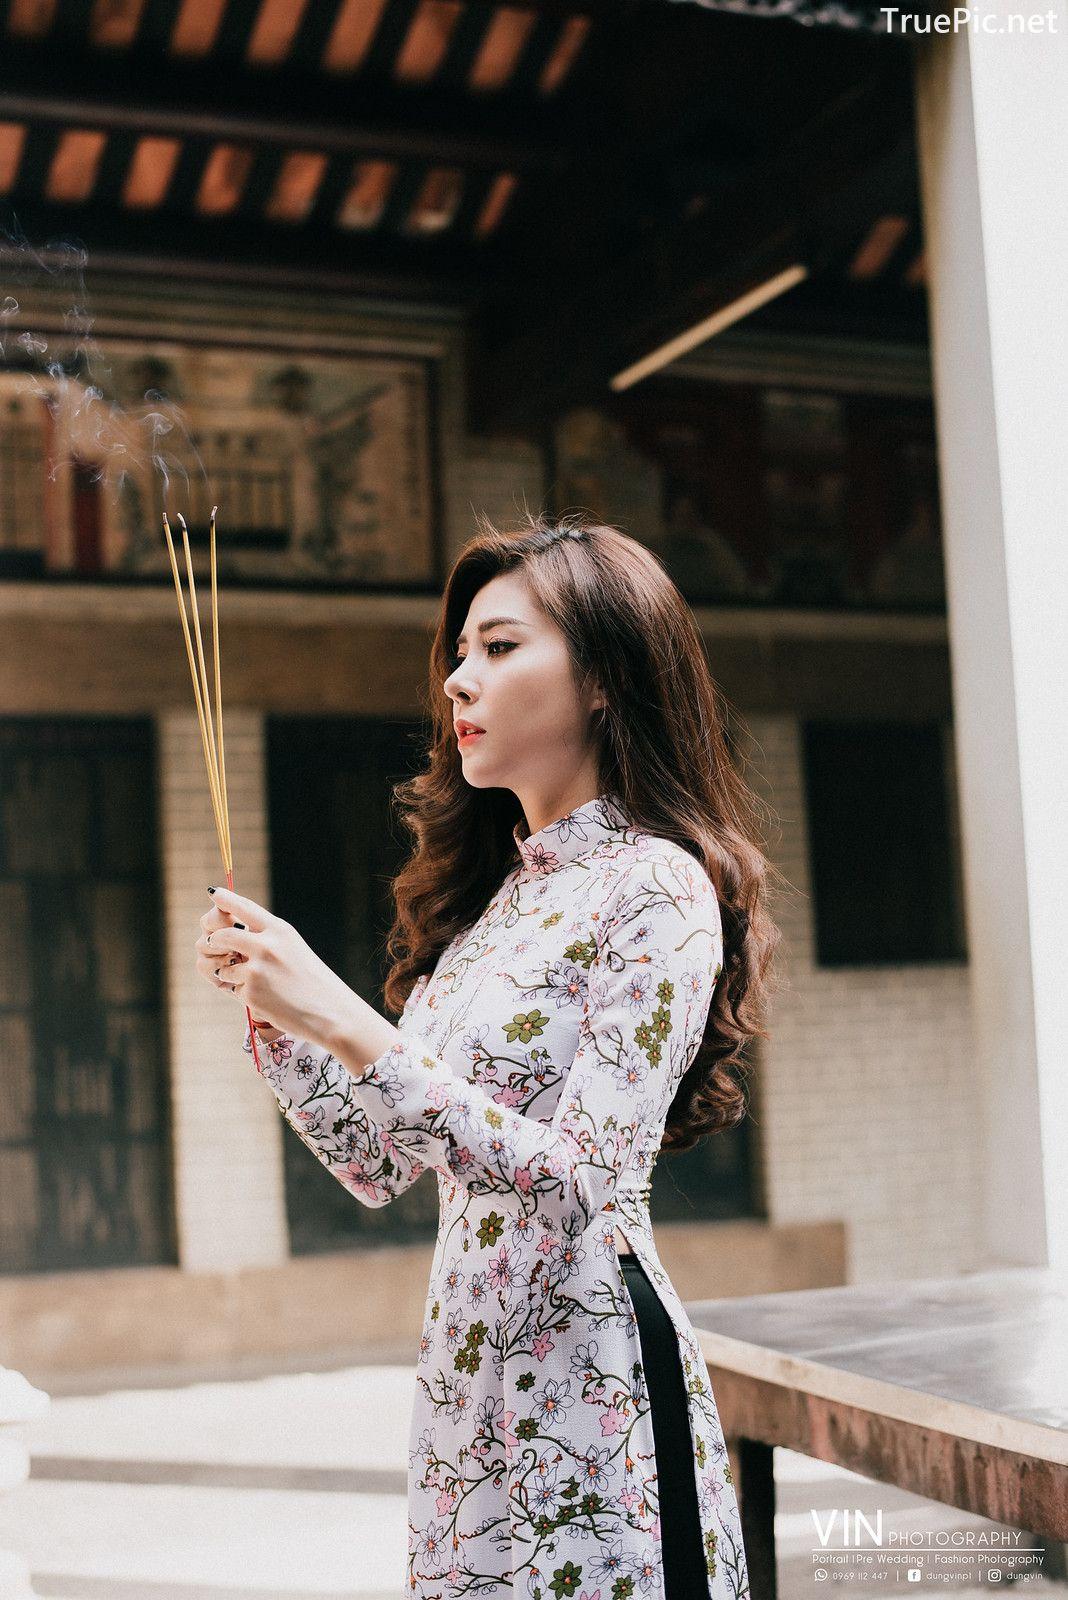 Image-Vietnamese-Beautiful-Girl-Ao-Dai-Vietnam-Traditional-Dress-by-VIN-Photo-3-TruePic.net- Picture-7